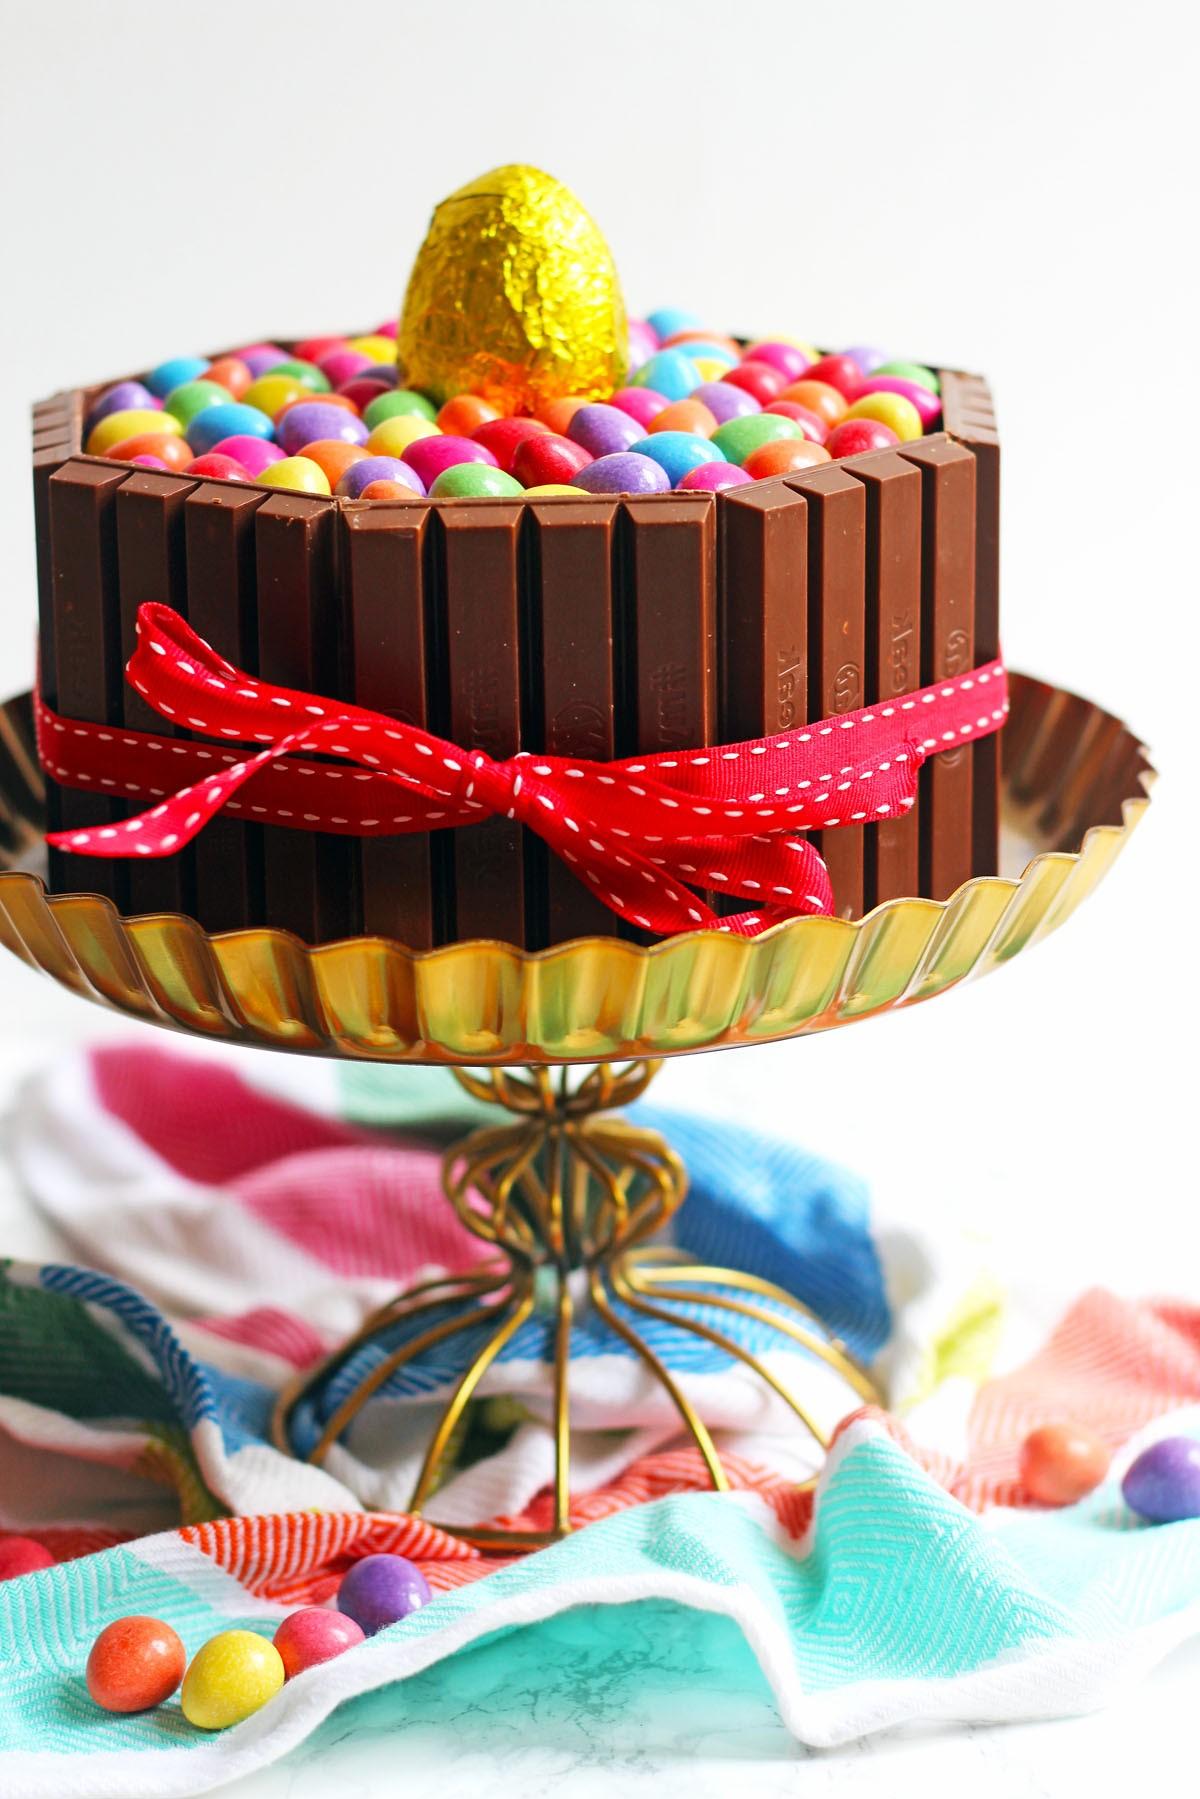 Gâteau de Pâques au chocolat.